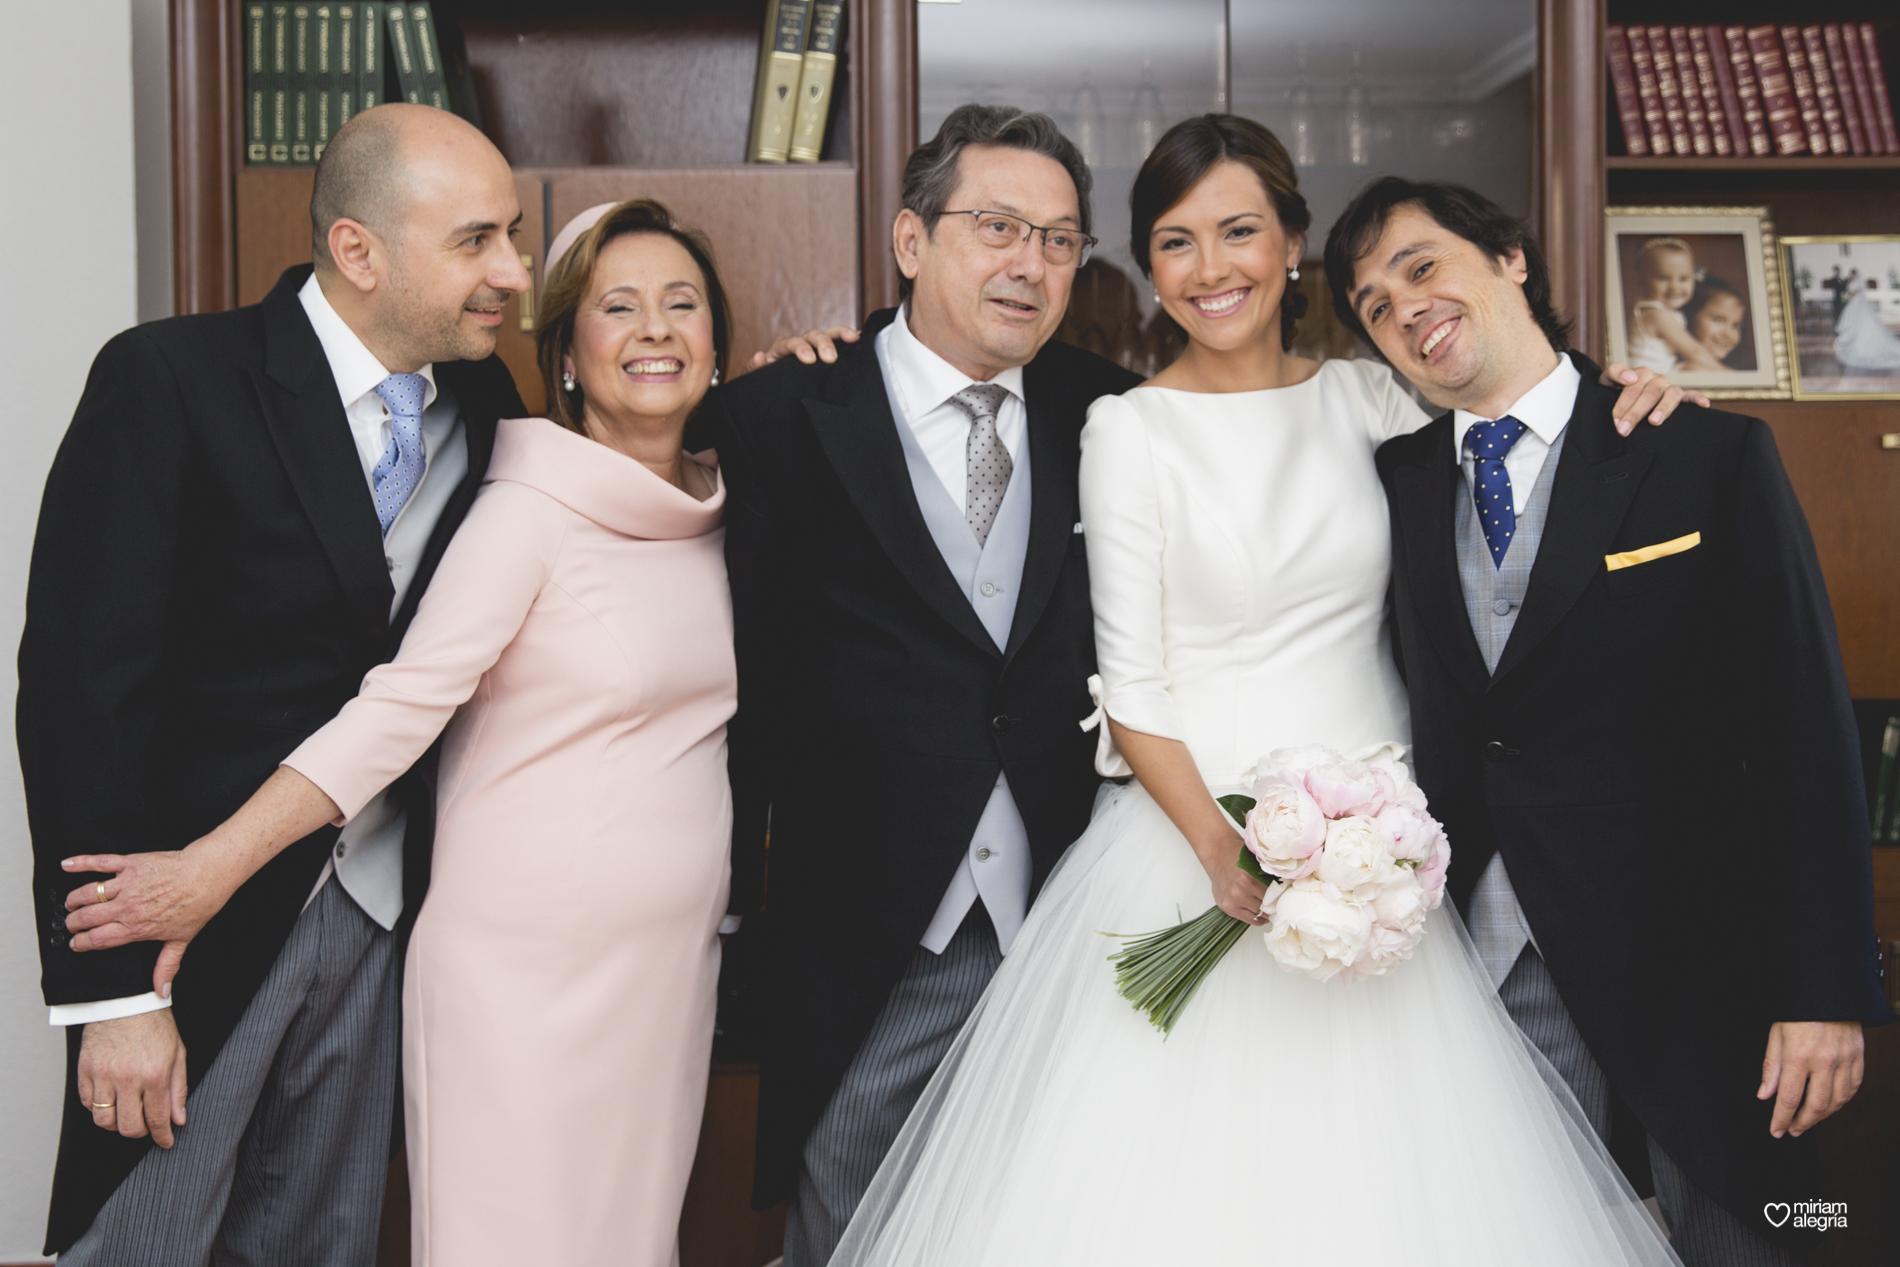 boda-en-la-catedral-de-murcia-miriam-alegria-fotografos-boda-murcia-21